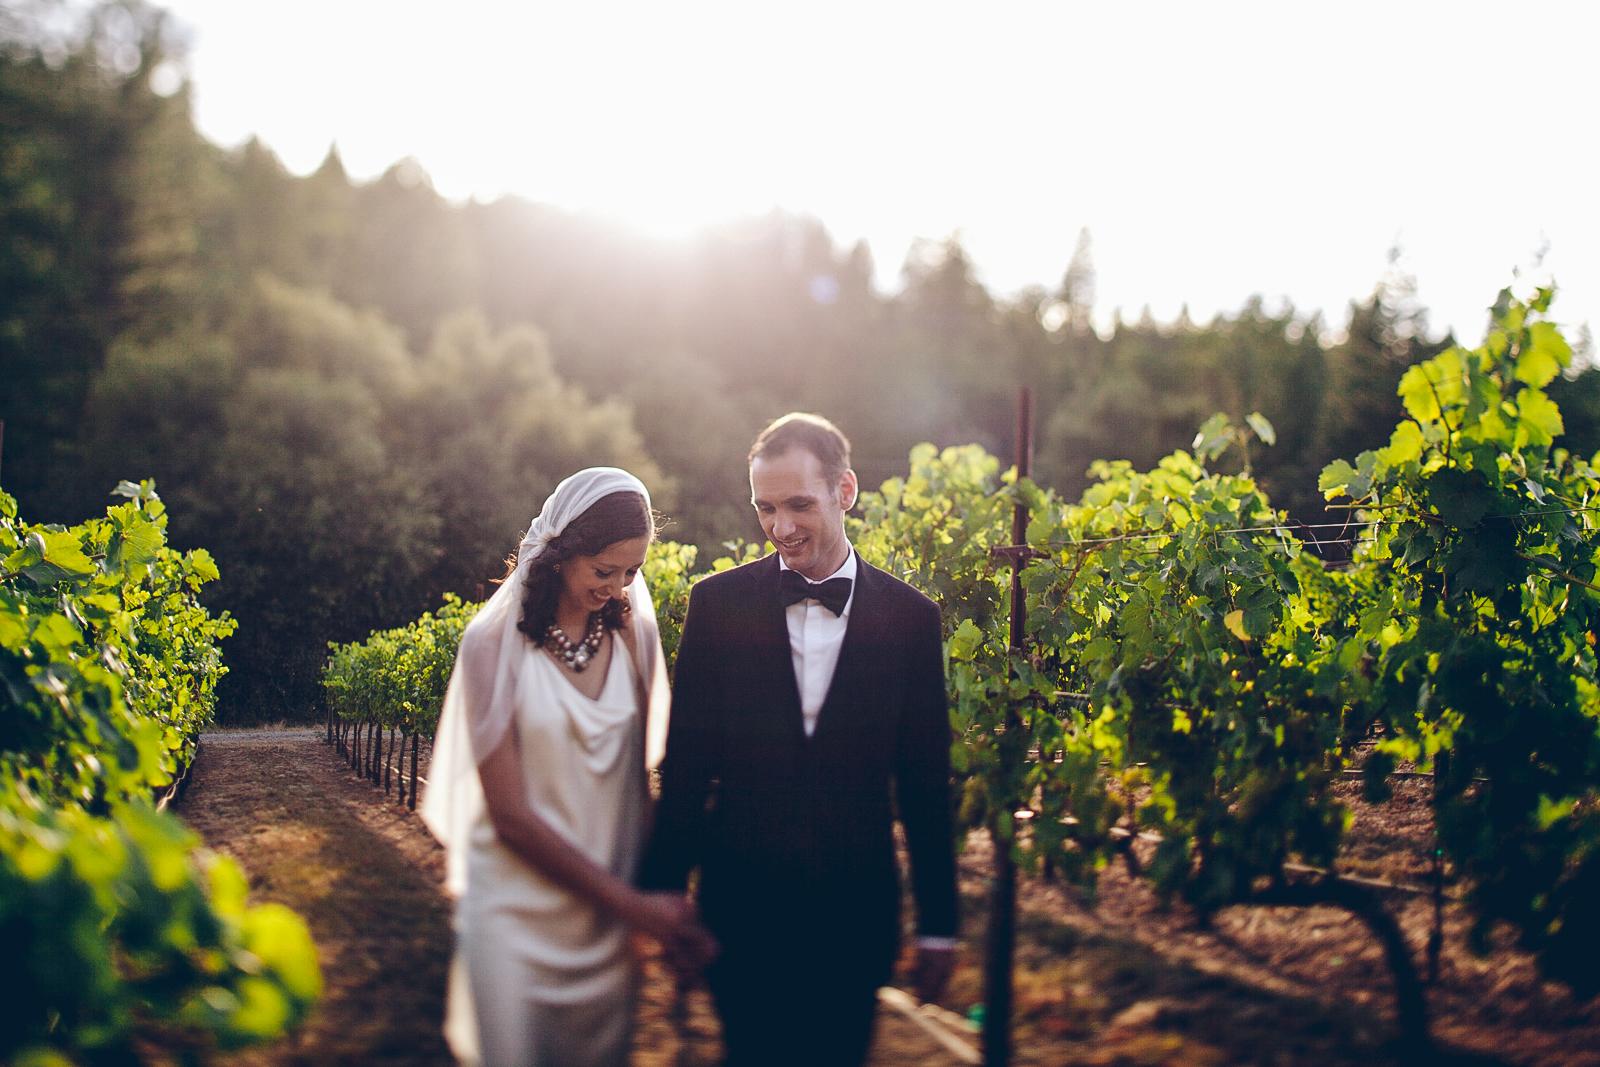 miraflores_winery_wedding_photography_ian_melissa_ebony_siovhan_bokeh_photography_53.jpg